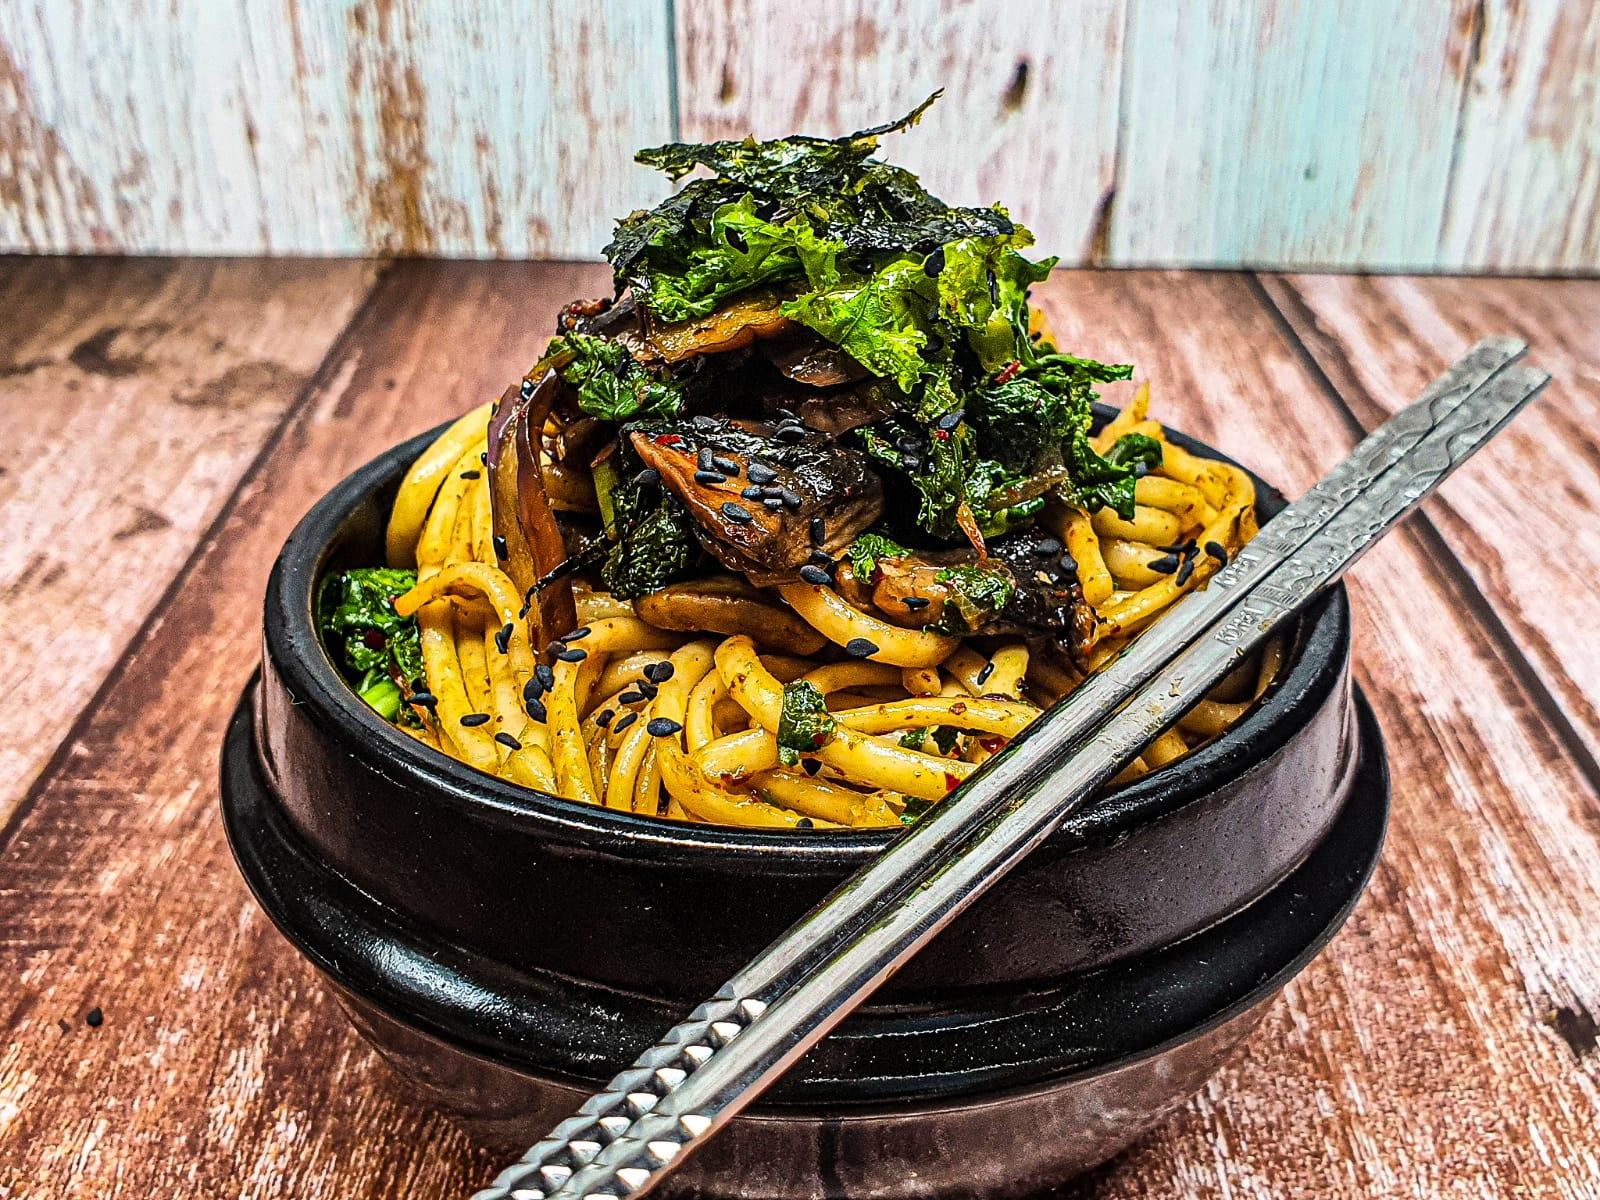 Vegan Recipes Cacao-Shamaness Vegan Udon Noodles with Kale Chinese Eggplant and Mushrooms